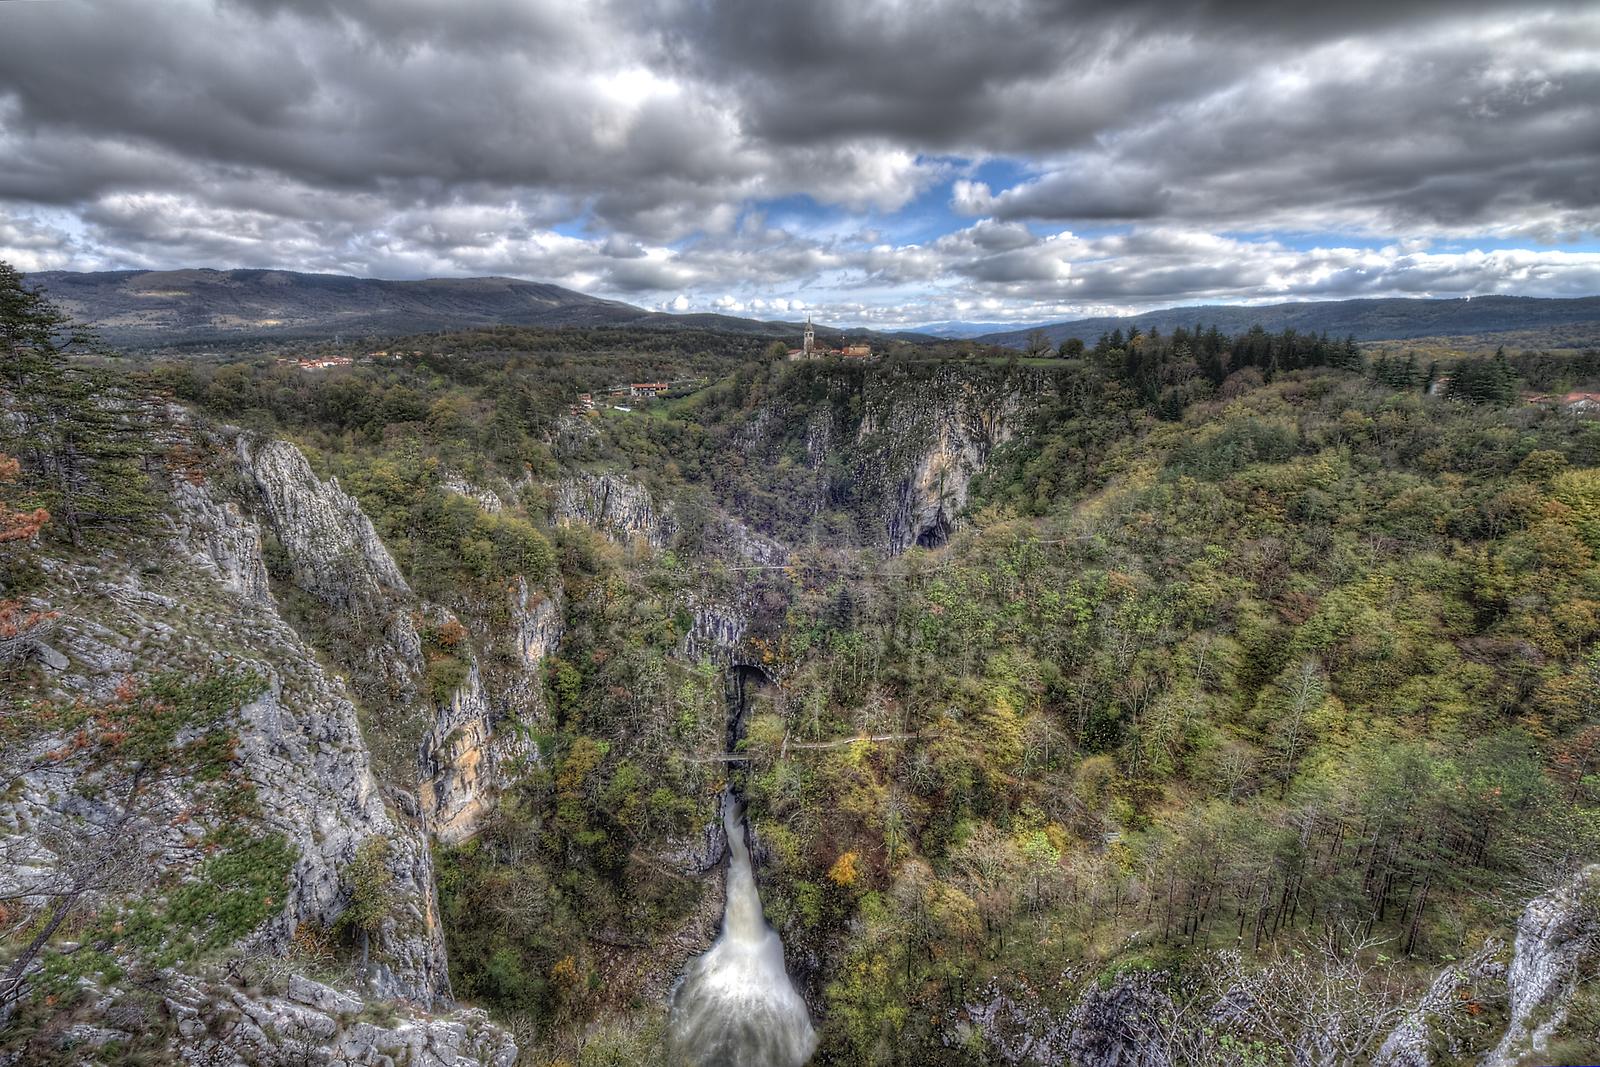 Cuevas de Skocjan, www.slovenia.info, Avtor: Alan Kosmac, Sidarta d.o.o.